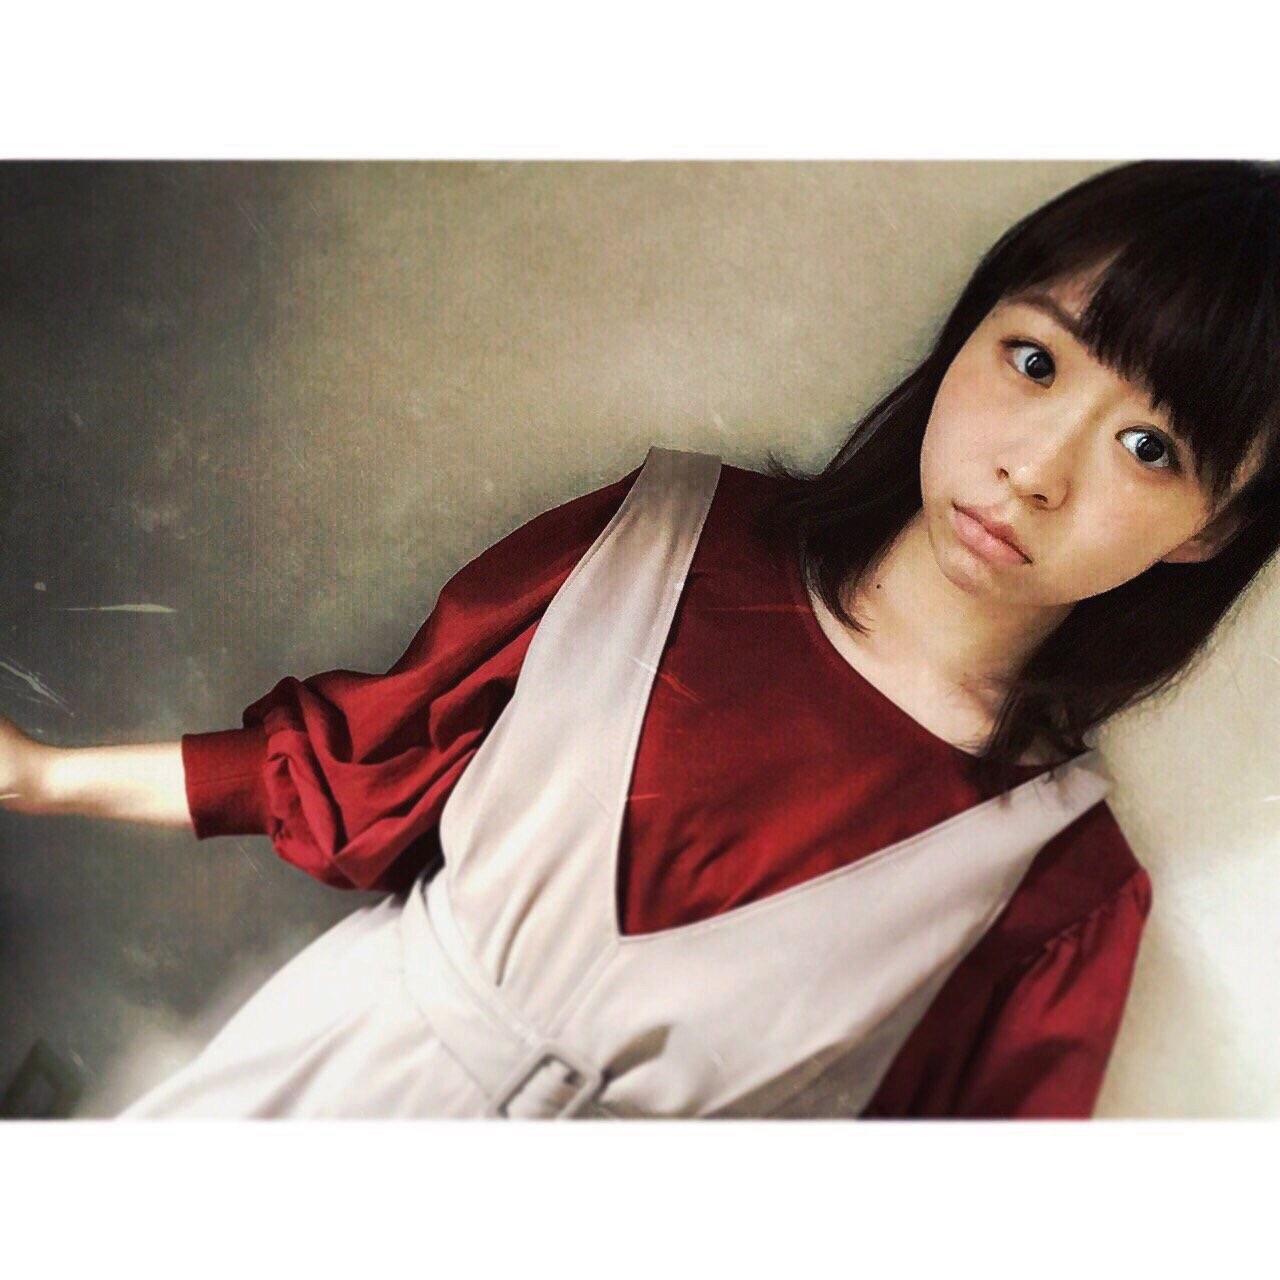 f:id:saitomayu:20160904194901j:image